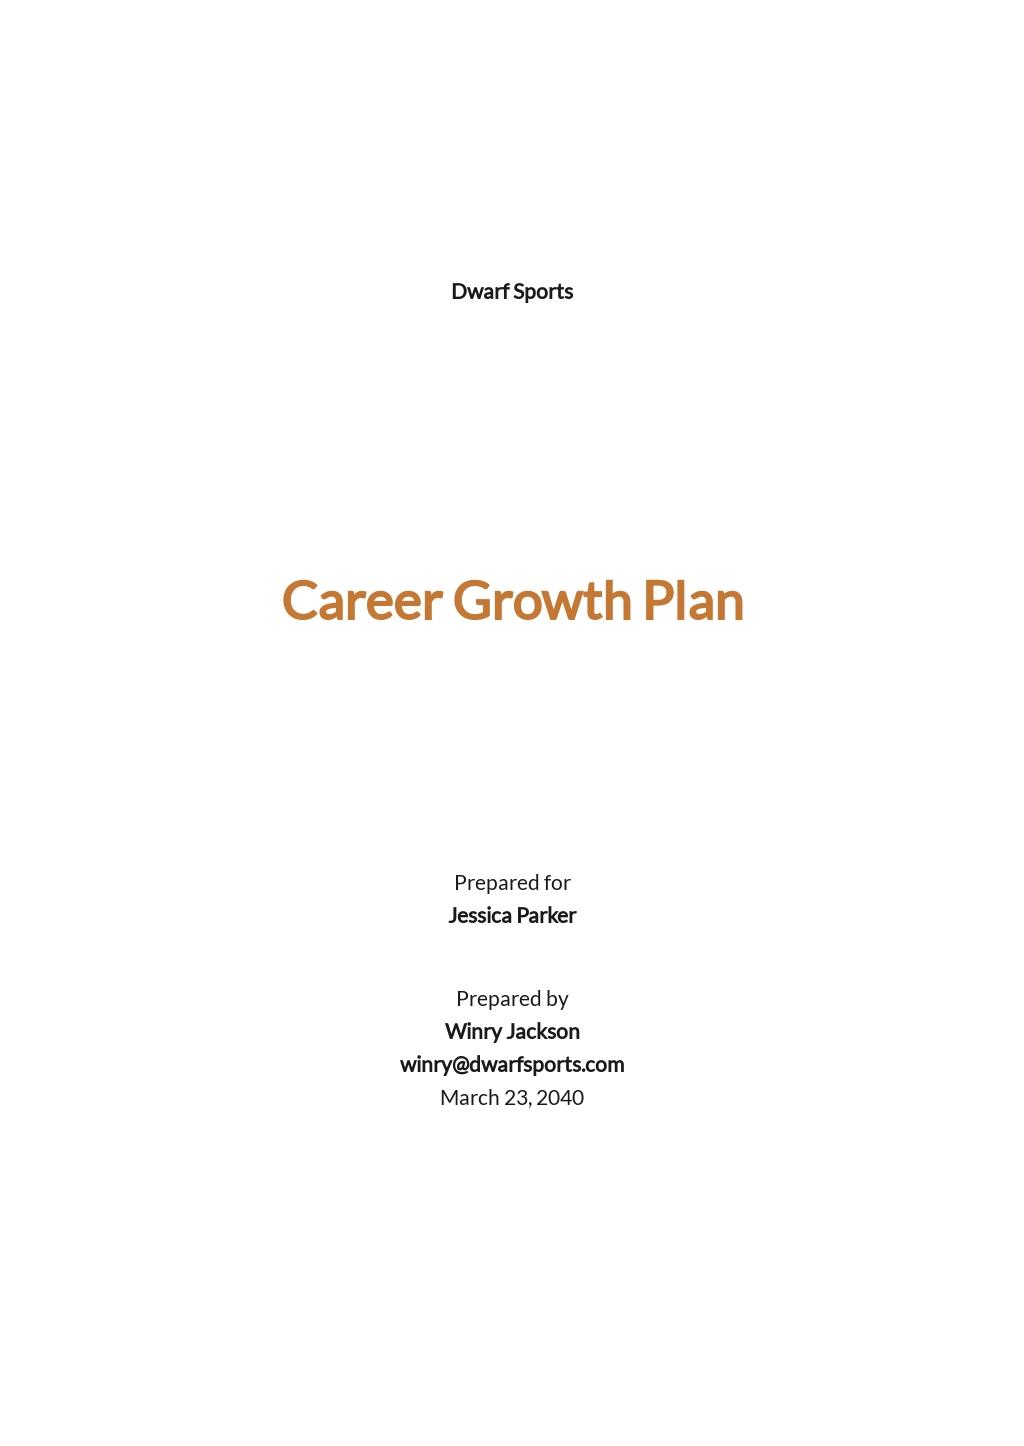 Career Growth Plan Template.jpe